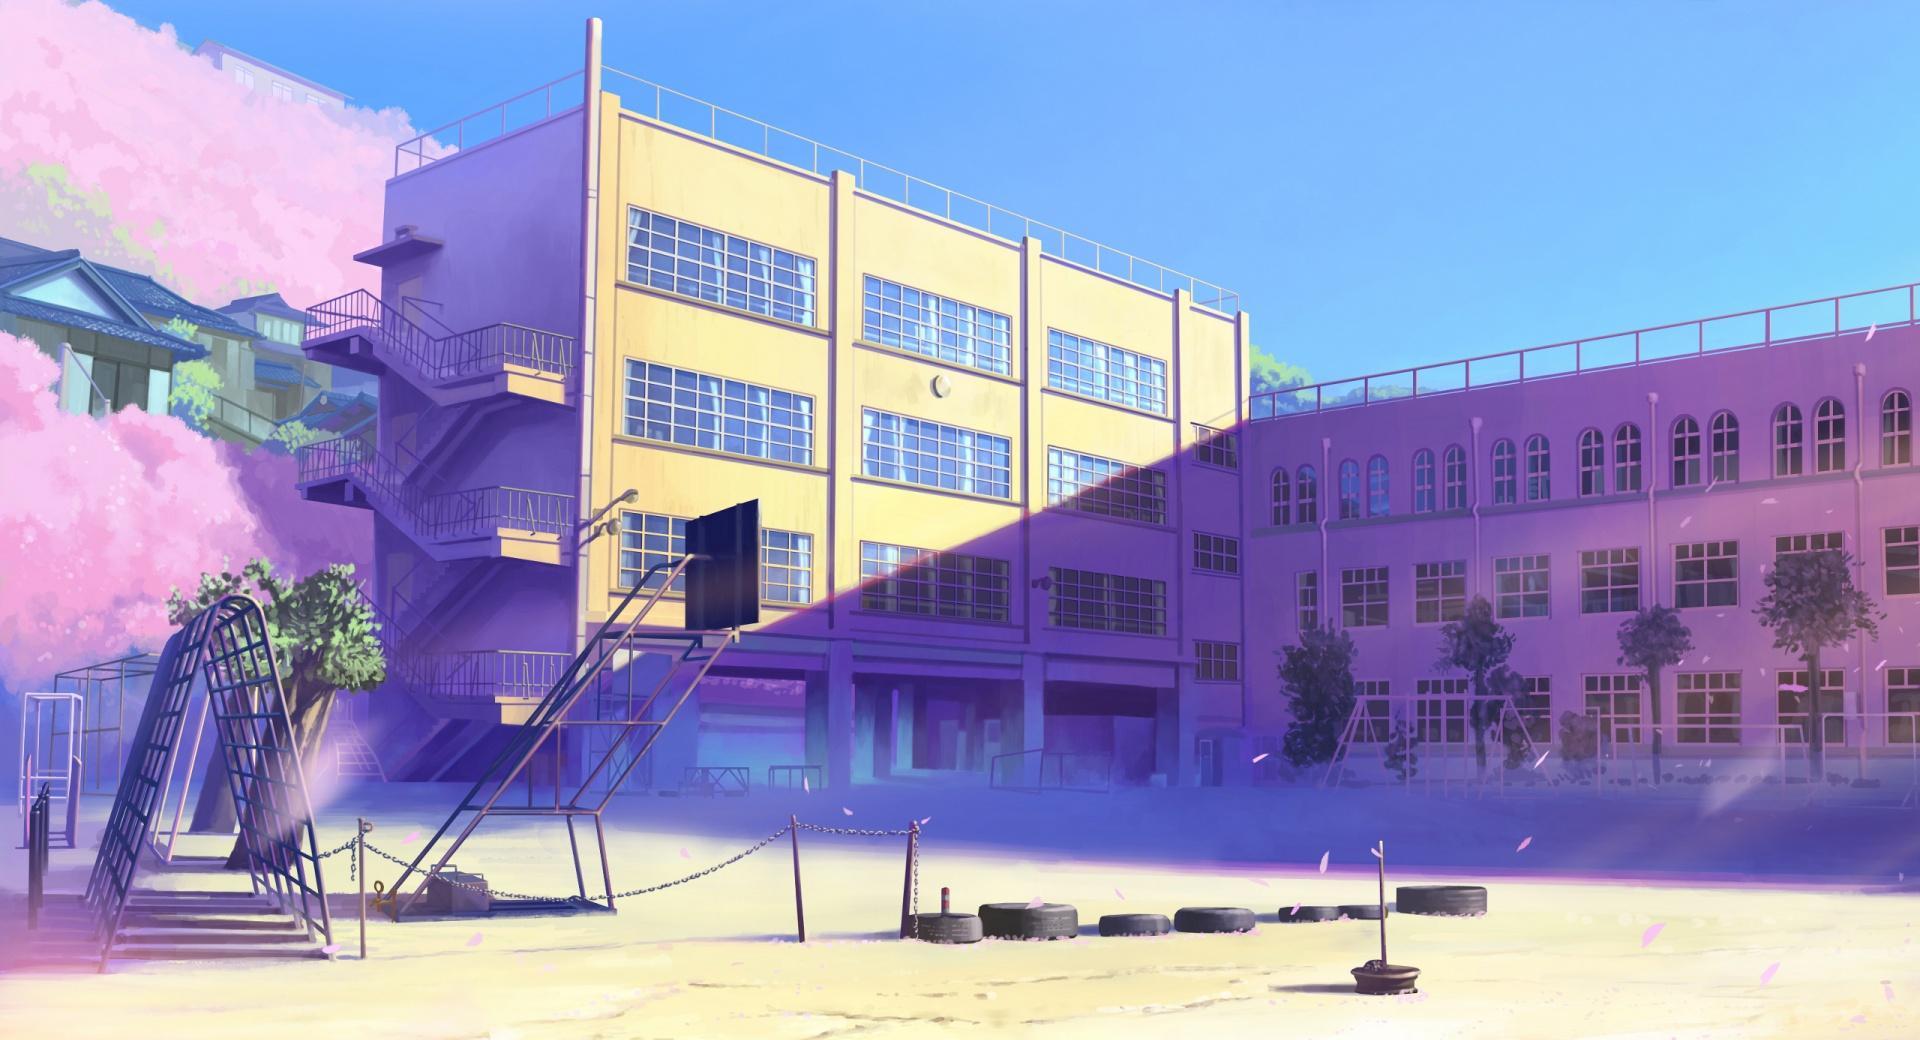 Schoolyard Manga wallpapers HD quality